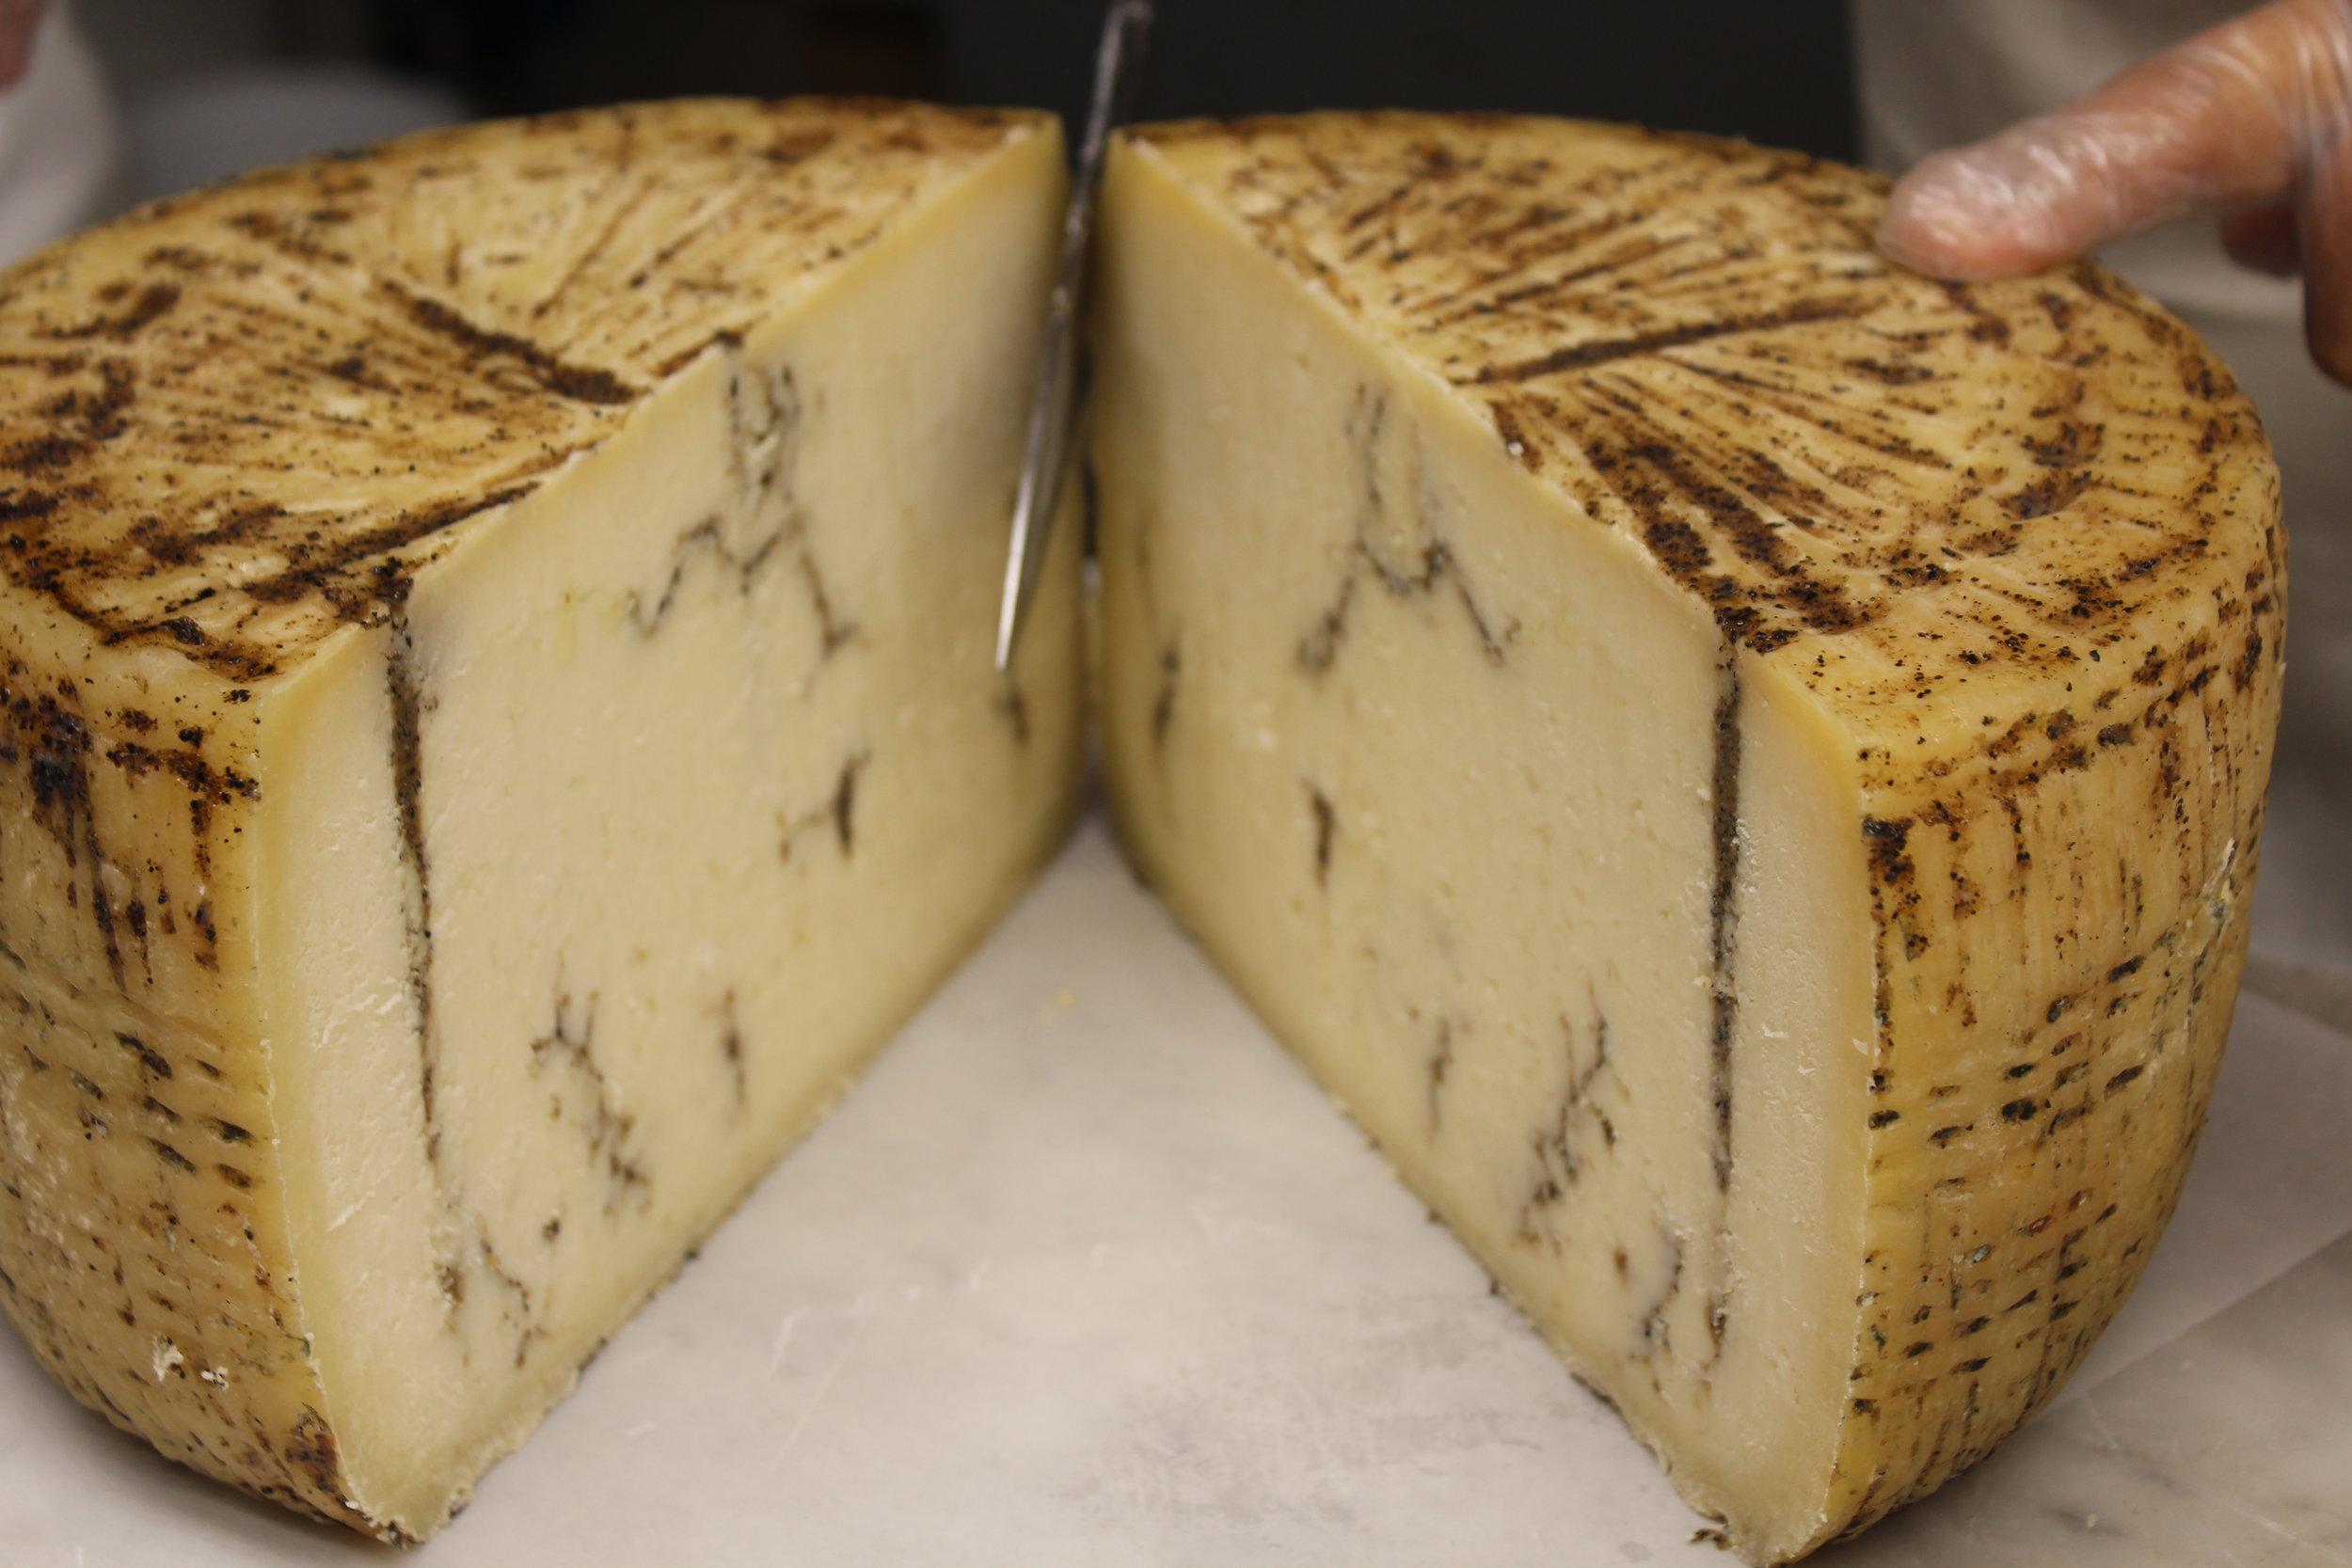 Pecorino cheese from Sardegna infused with ribbons of black truffles at Calandra's Cheese.